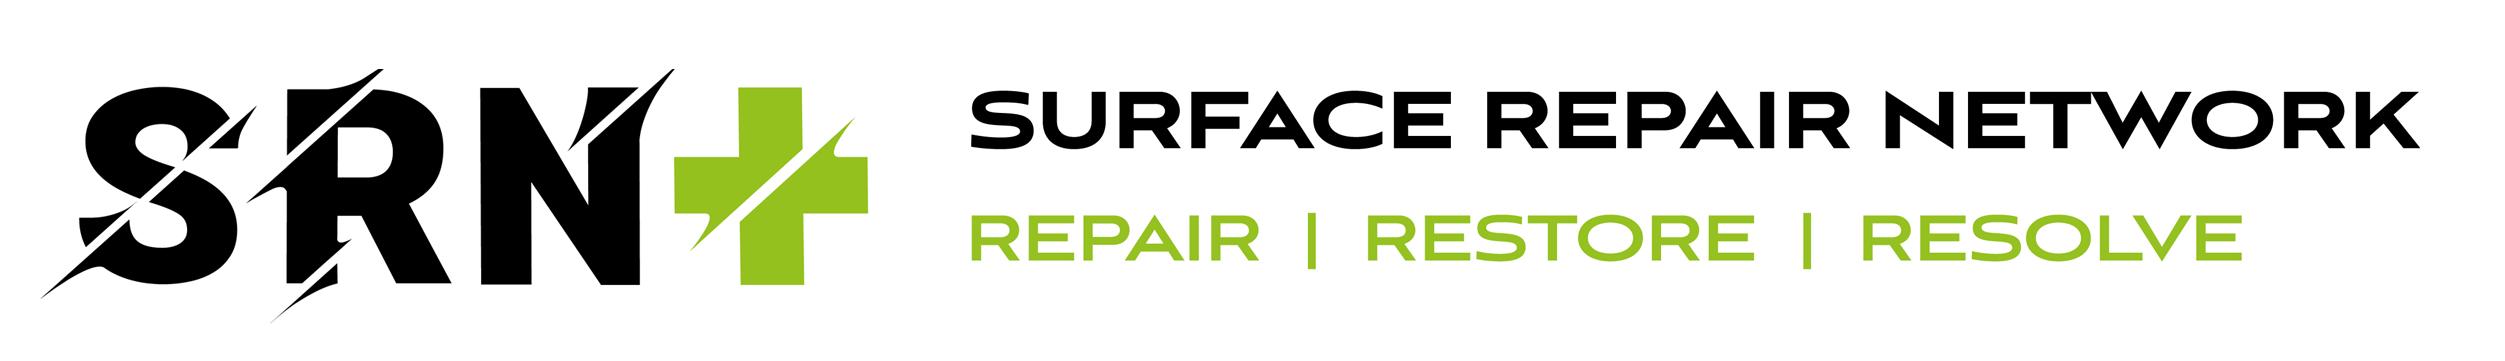 Surface Repair Network